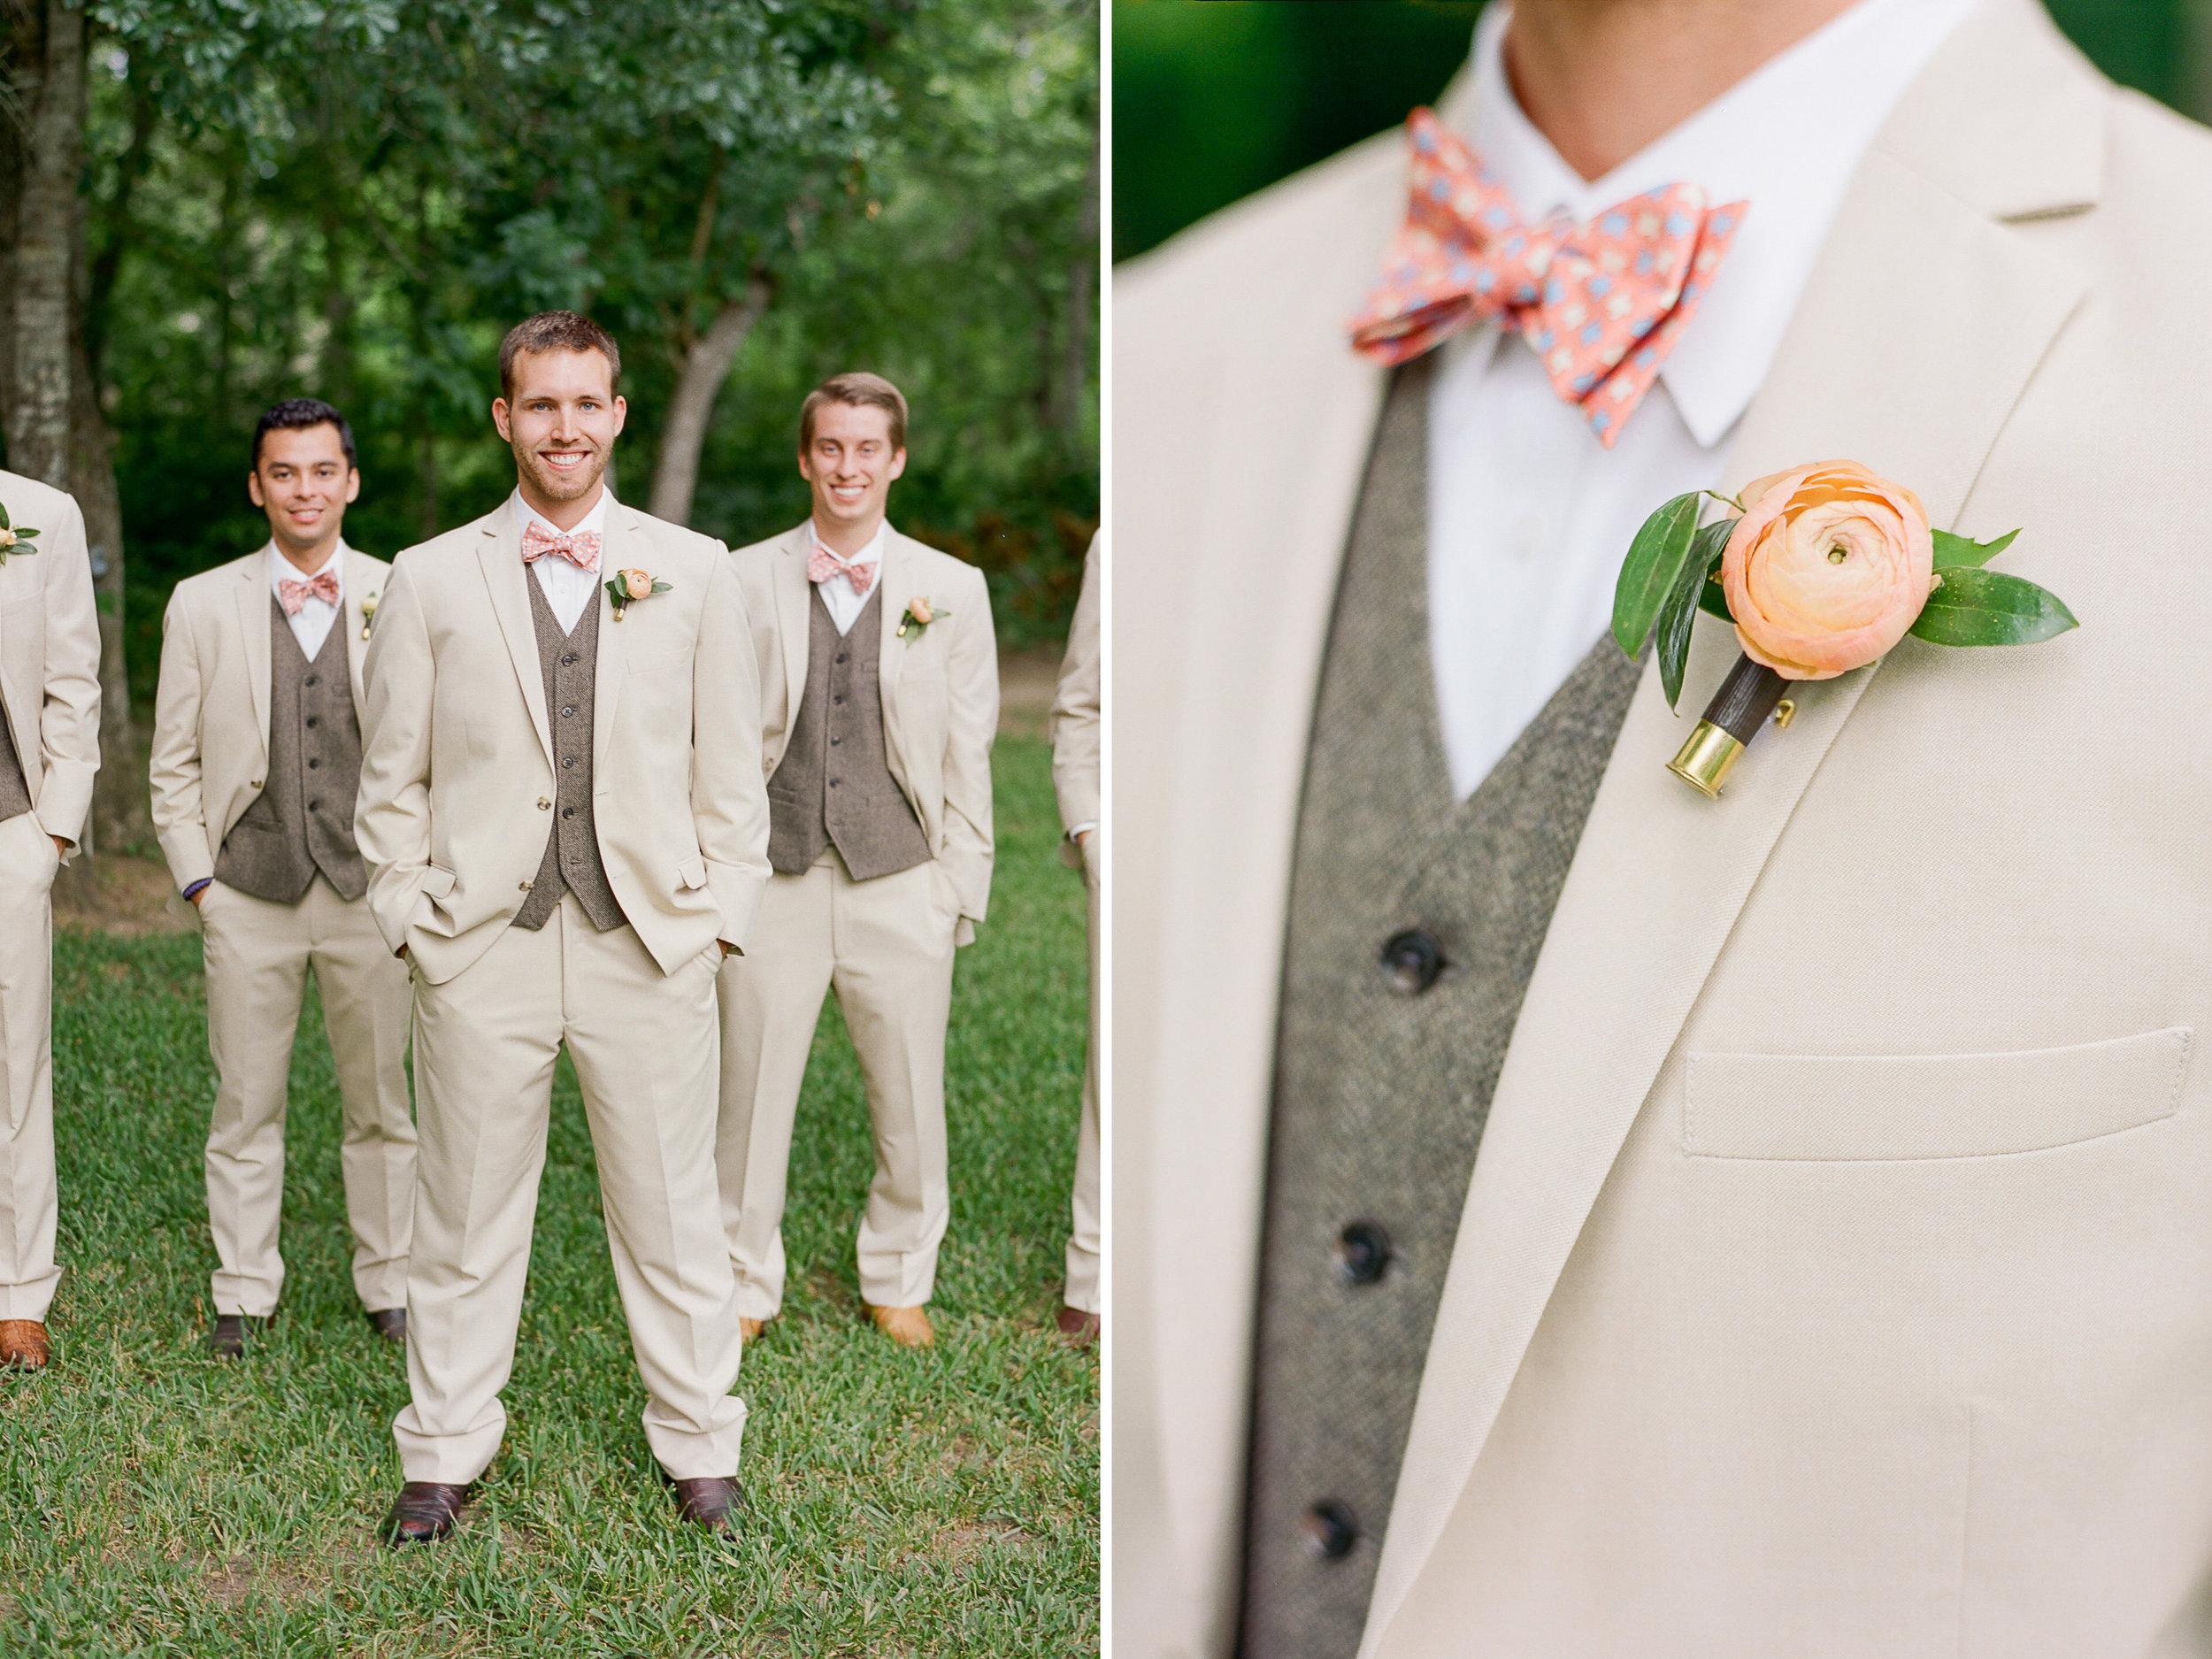 The-Knot-Wedding-Houston-Photographer-Fine-Art-Dana-Fernandez-Photography-Film-121.jpg